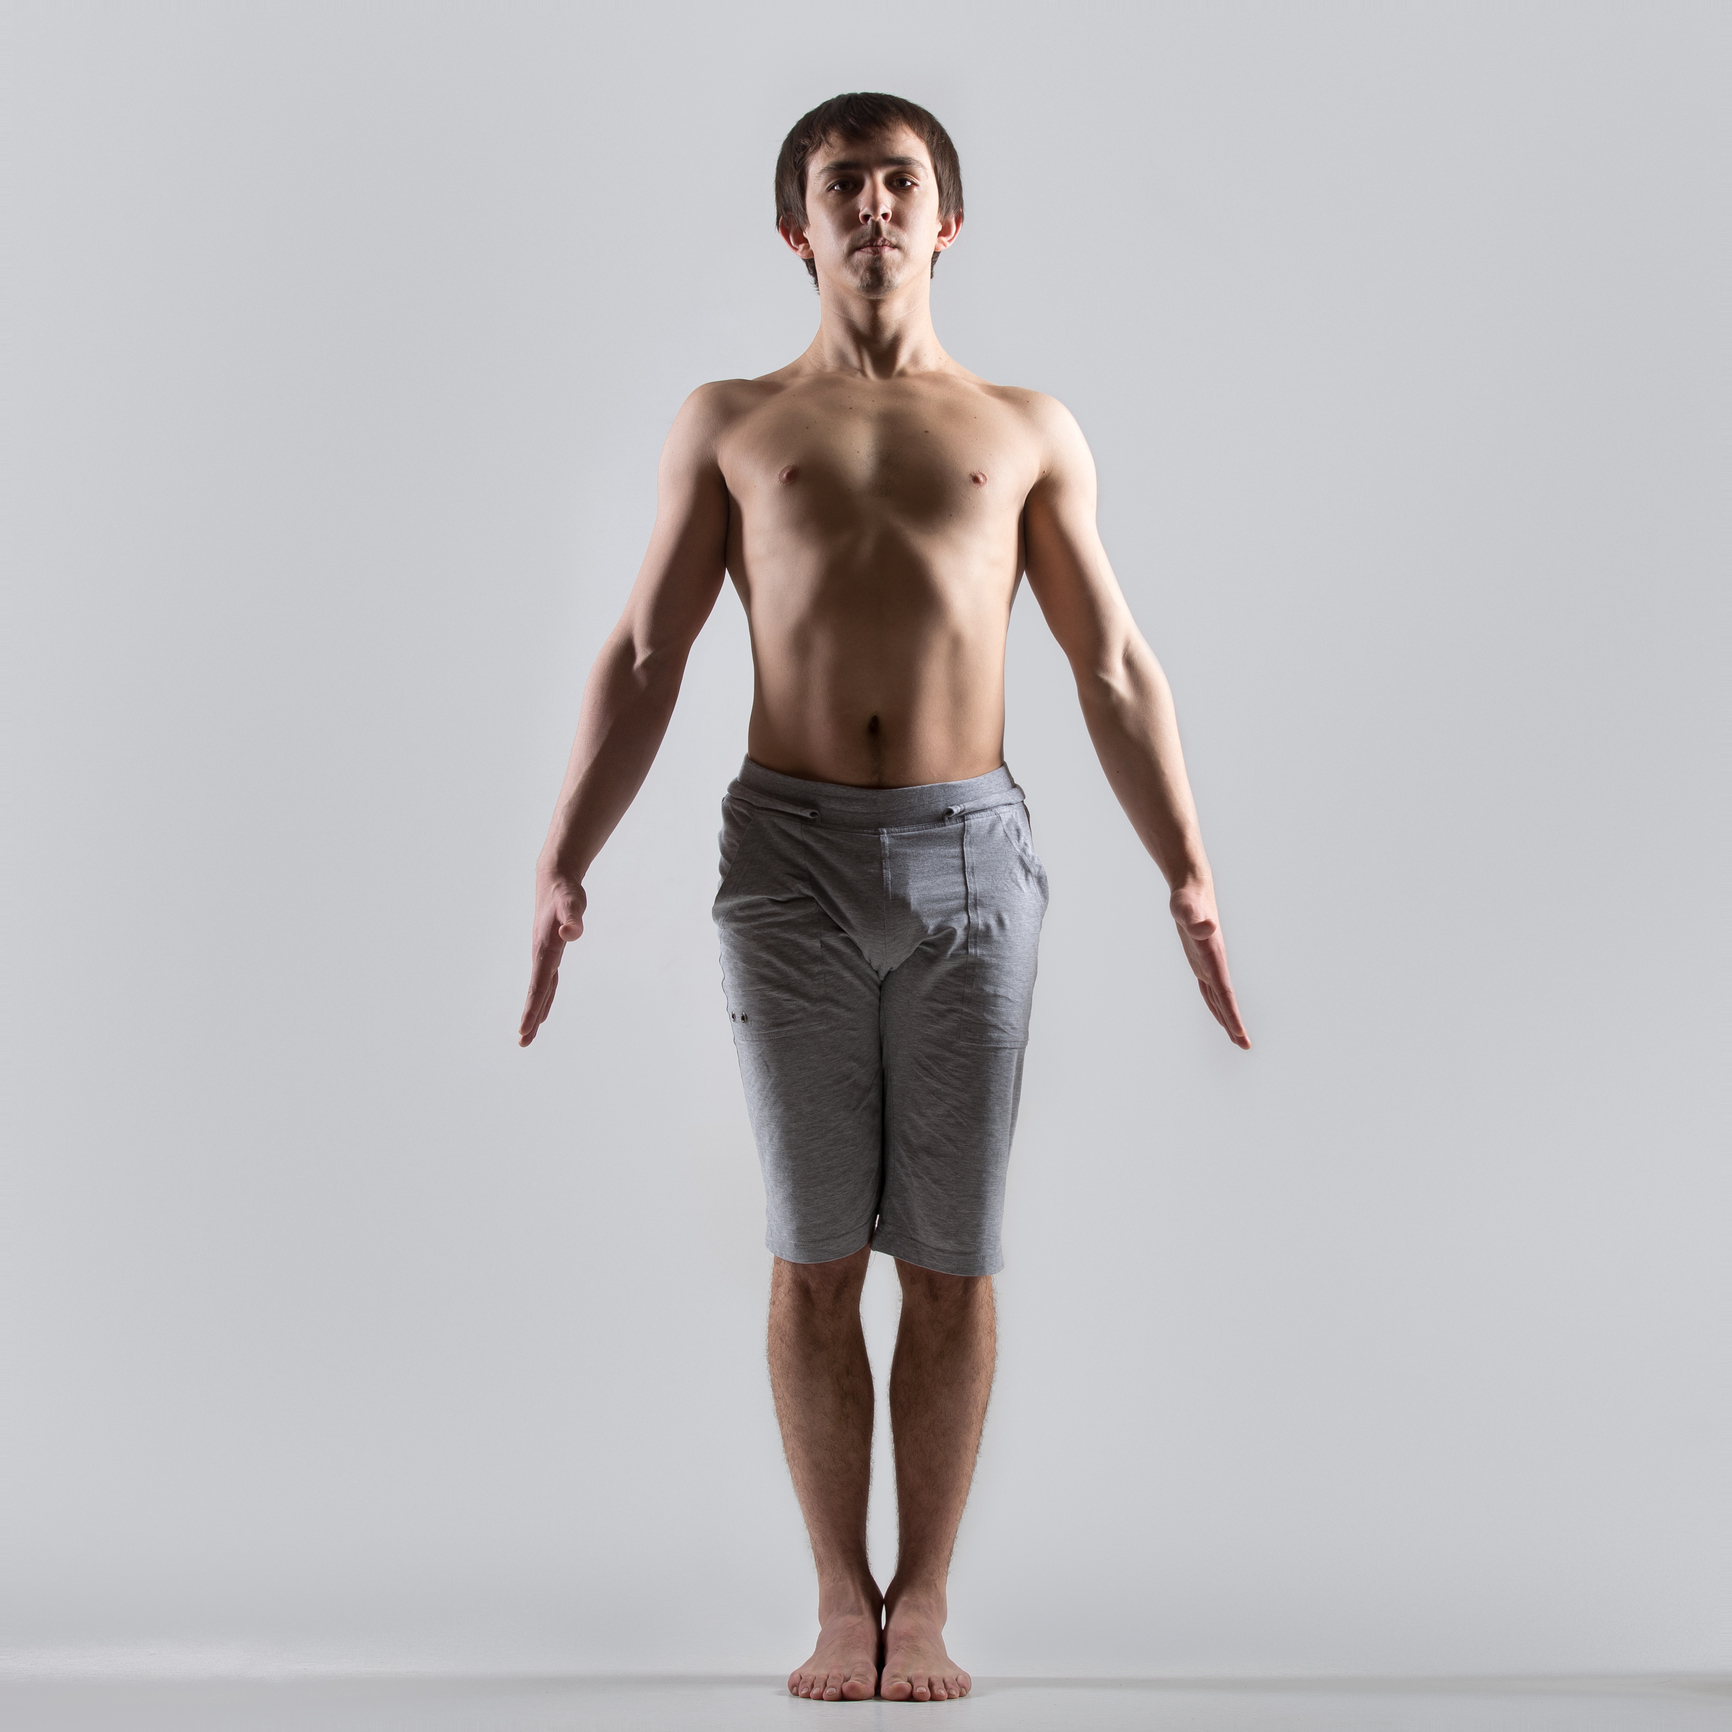 Yoga Pose: Mountain Pose | YogaClassPlan.com